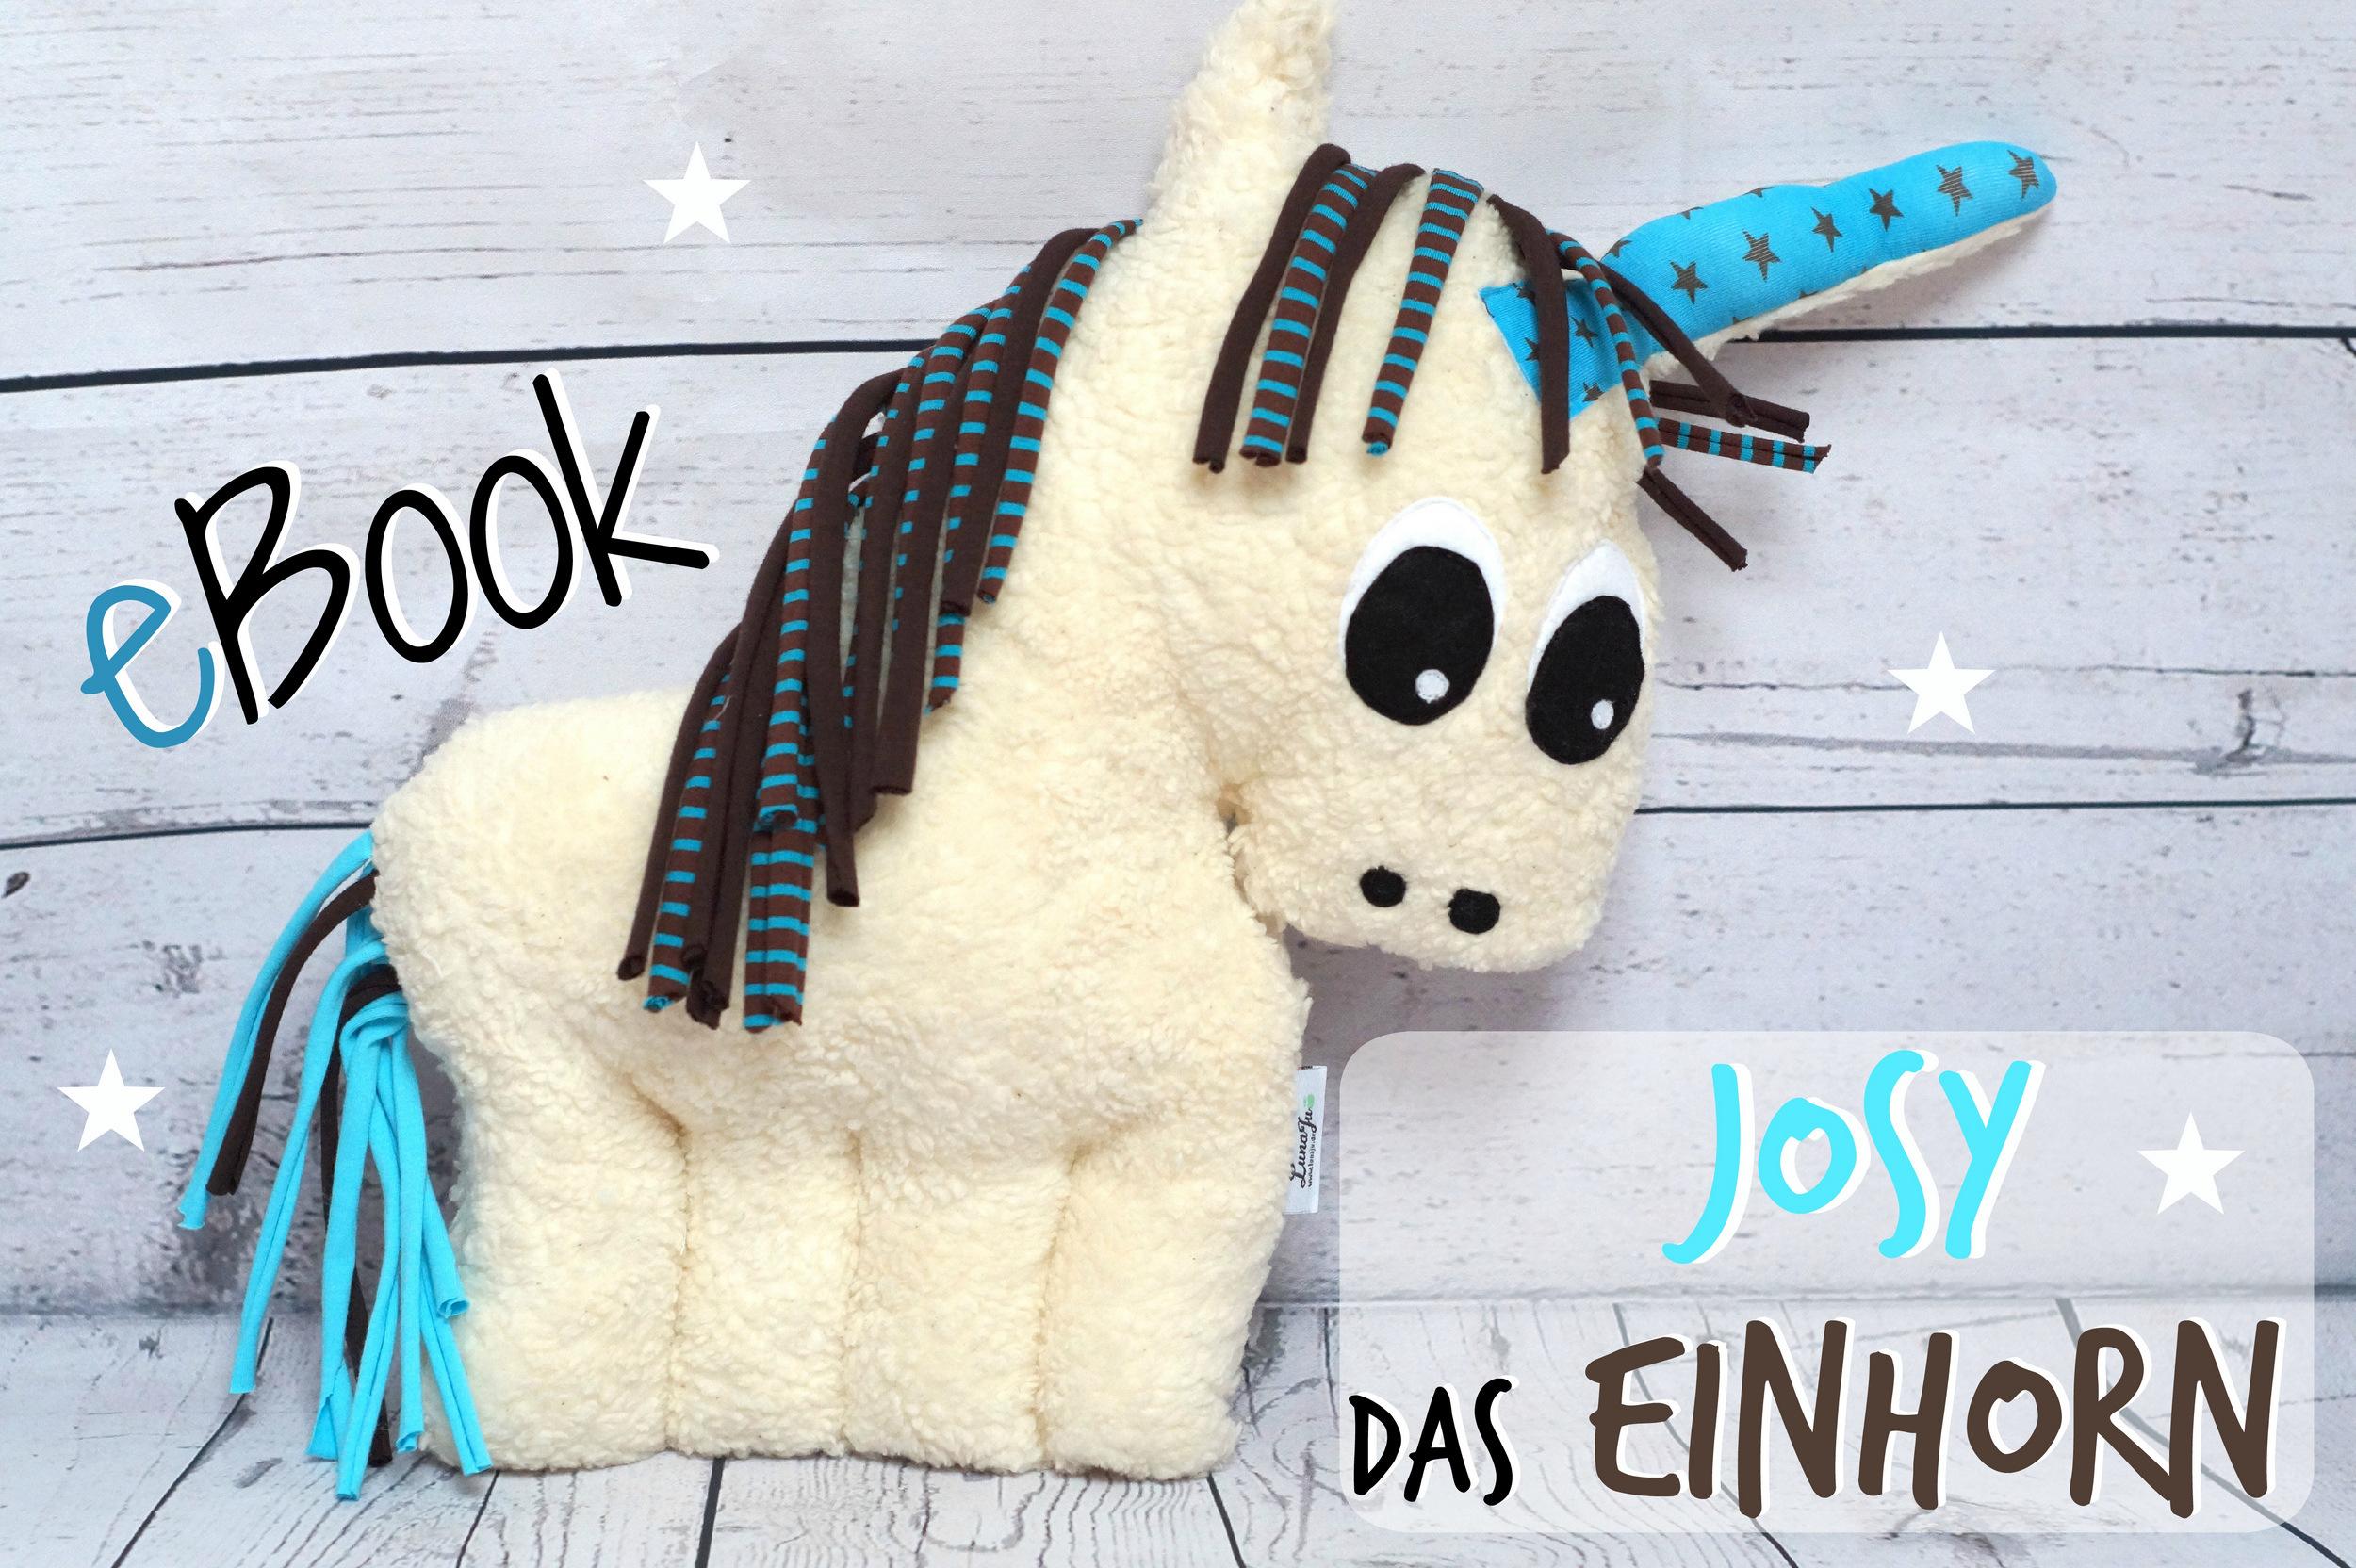 Ebook Josy das Einhorn- Nähanleitung, Schnitt.